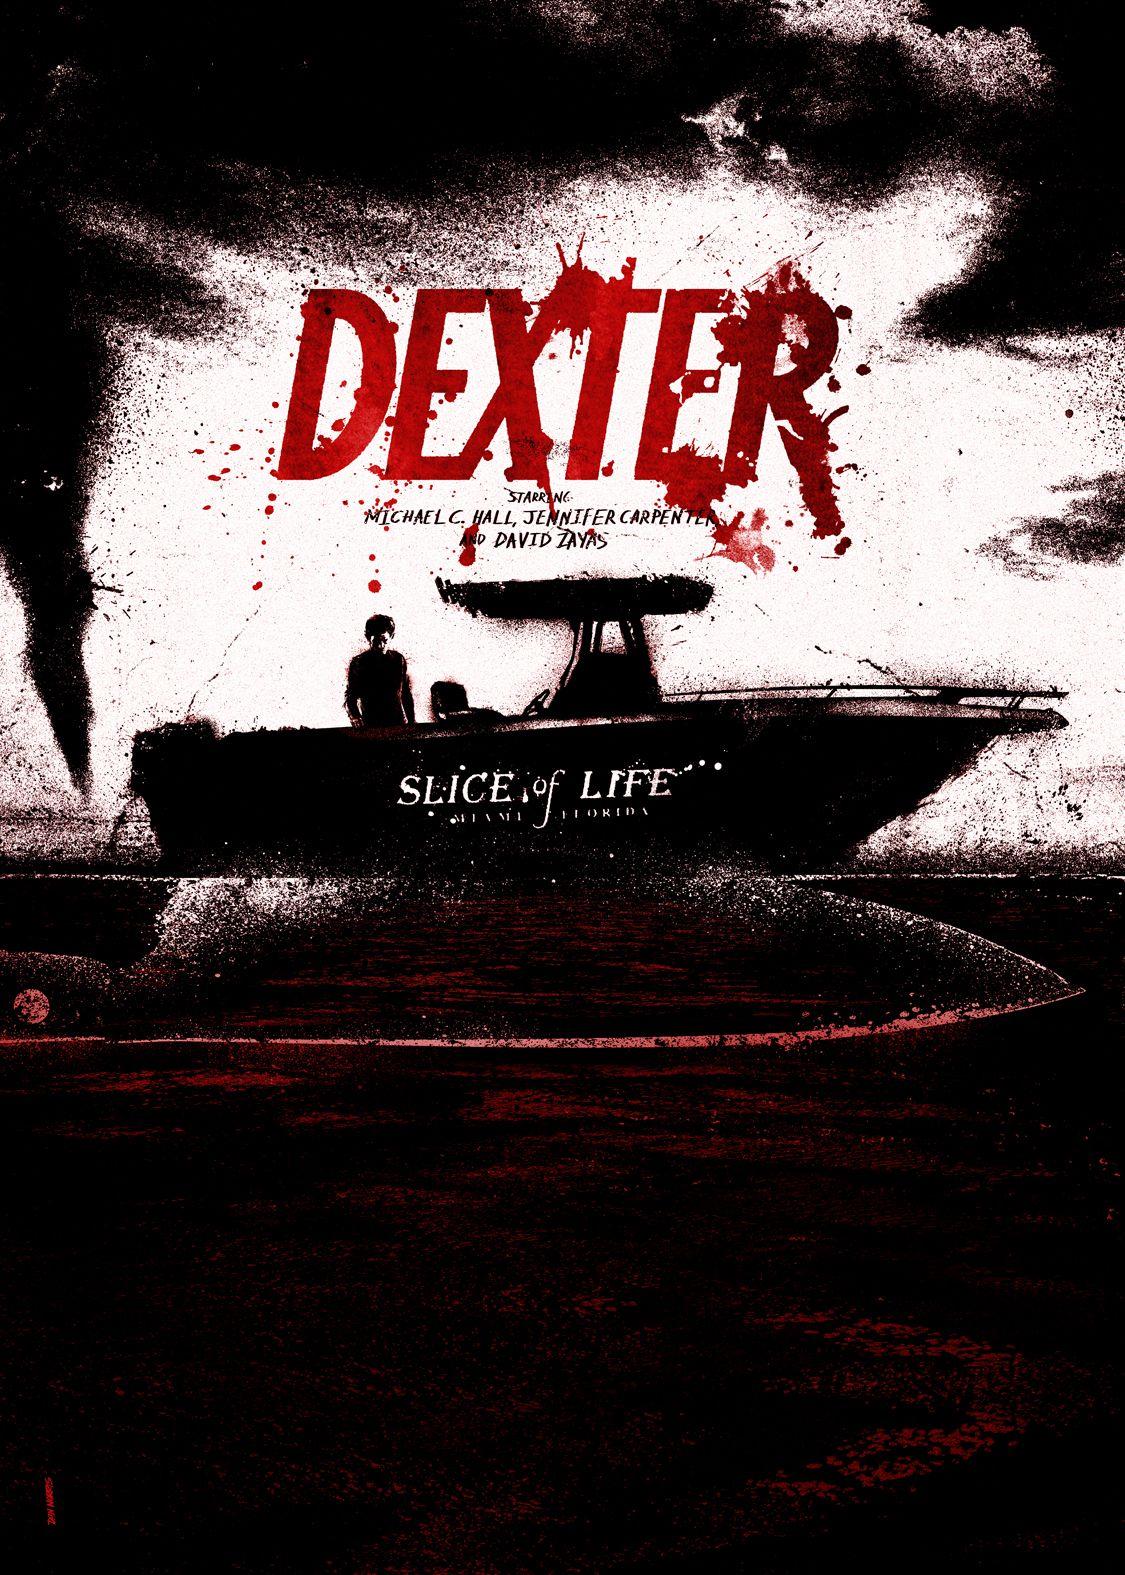 Dexter 2006 2013 Minimal Tv Series Poster By Daniel Norris Dexter Poster Dexter Wallpaper Dexter